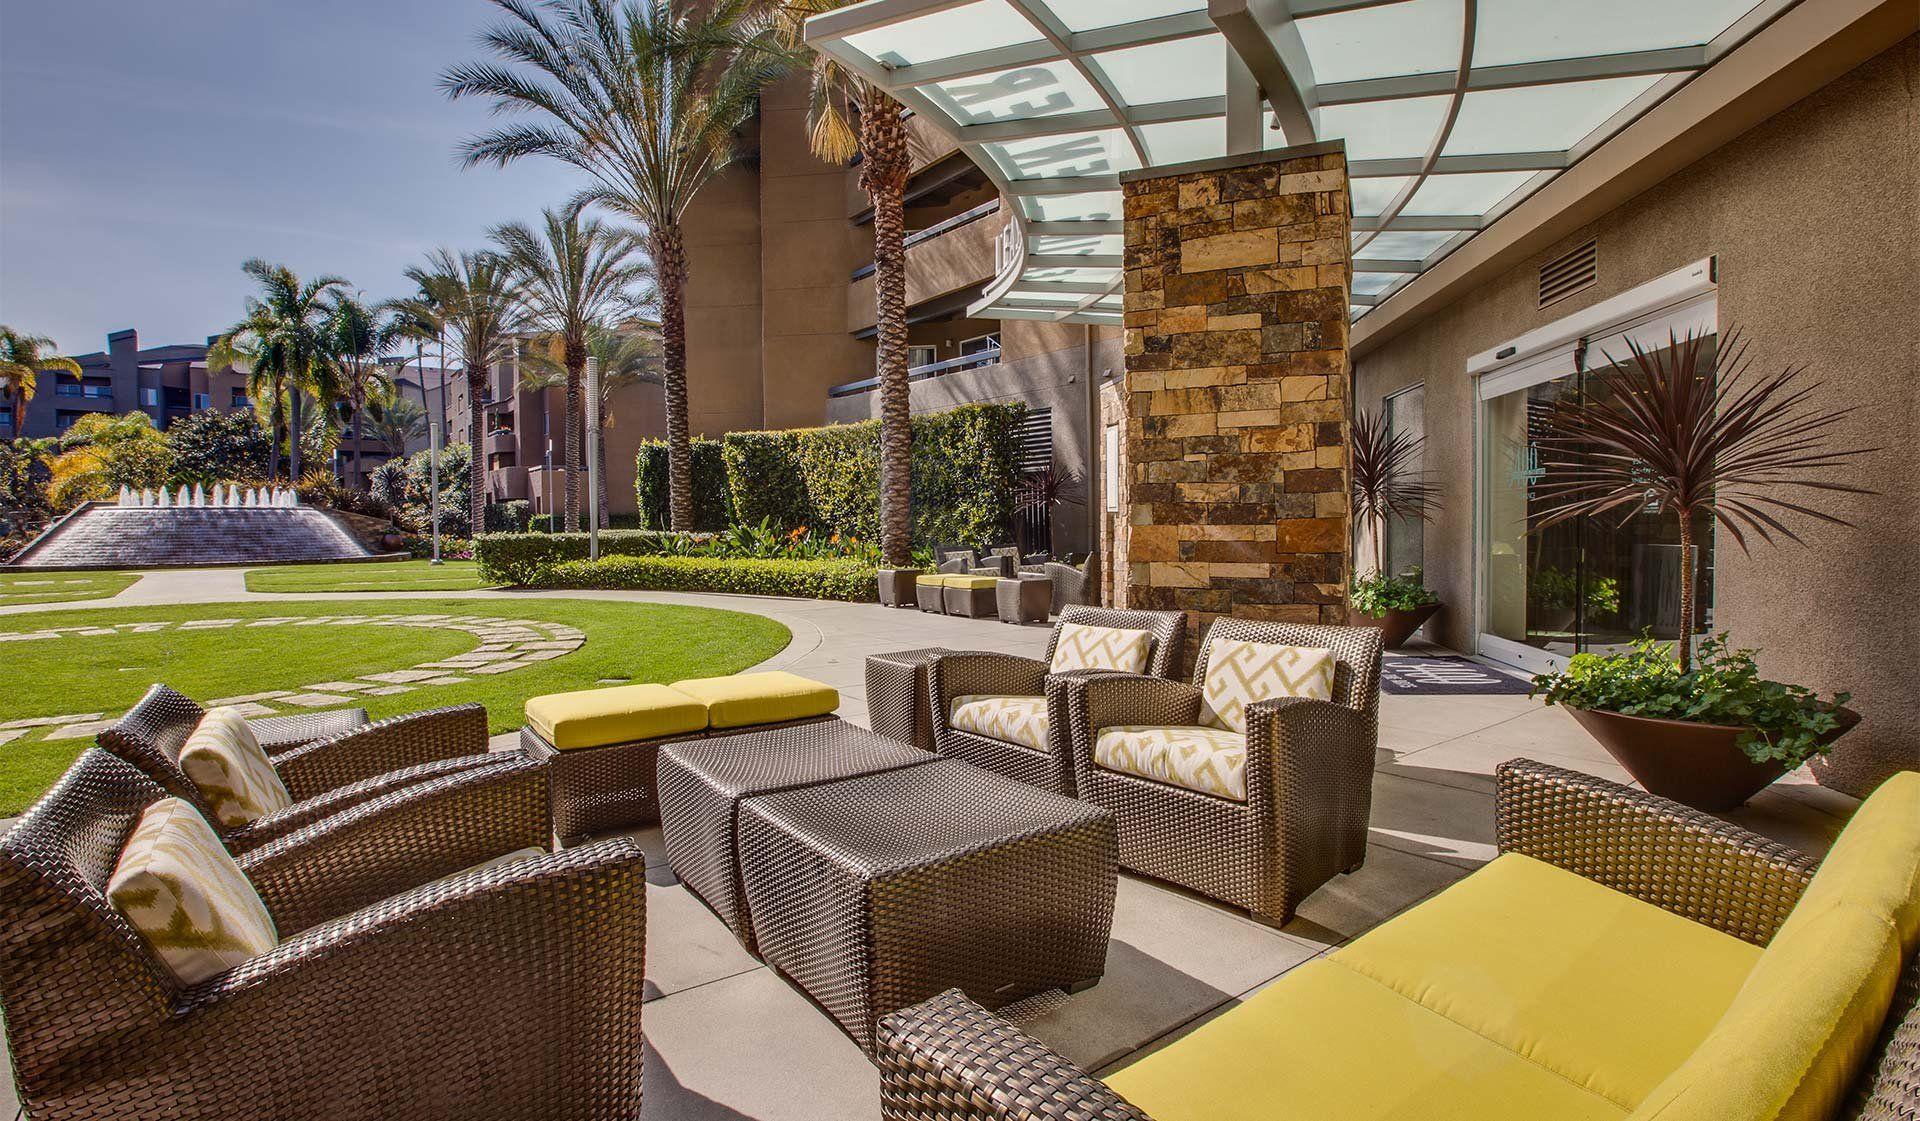 Costa Mesa Ca Apartments 3400 Avenue Of The Arts Apartments Fireplace Life Goals